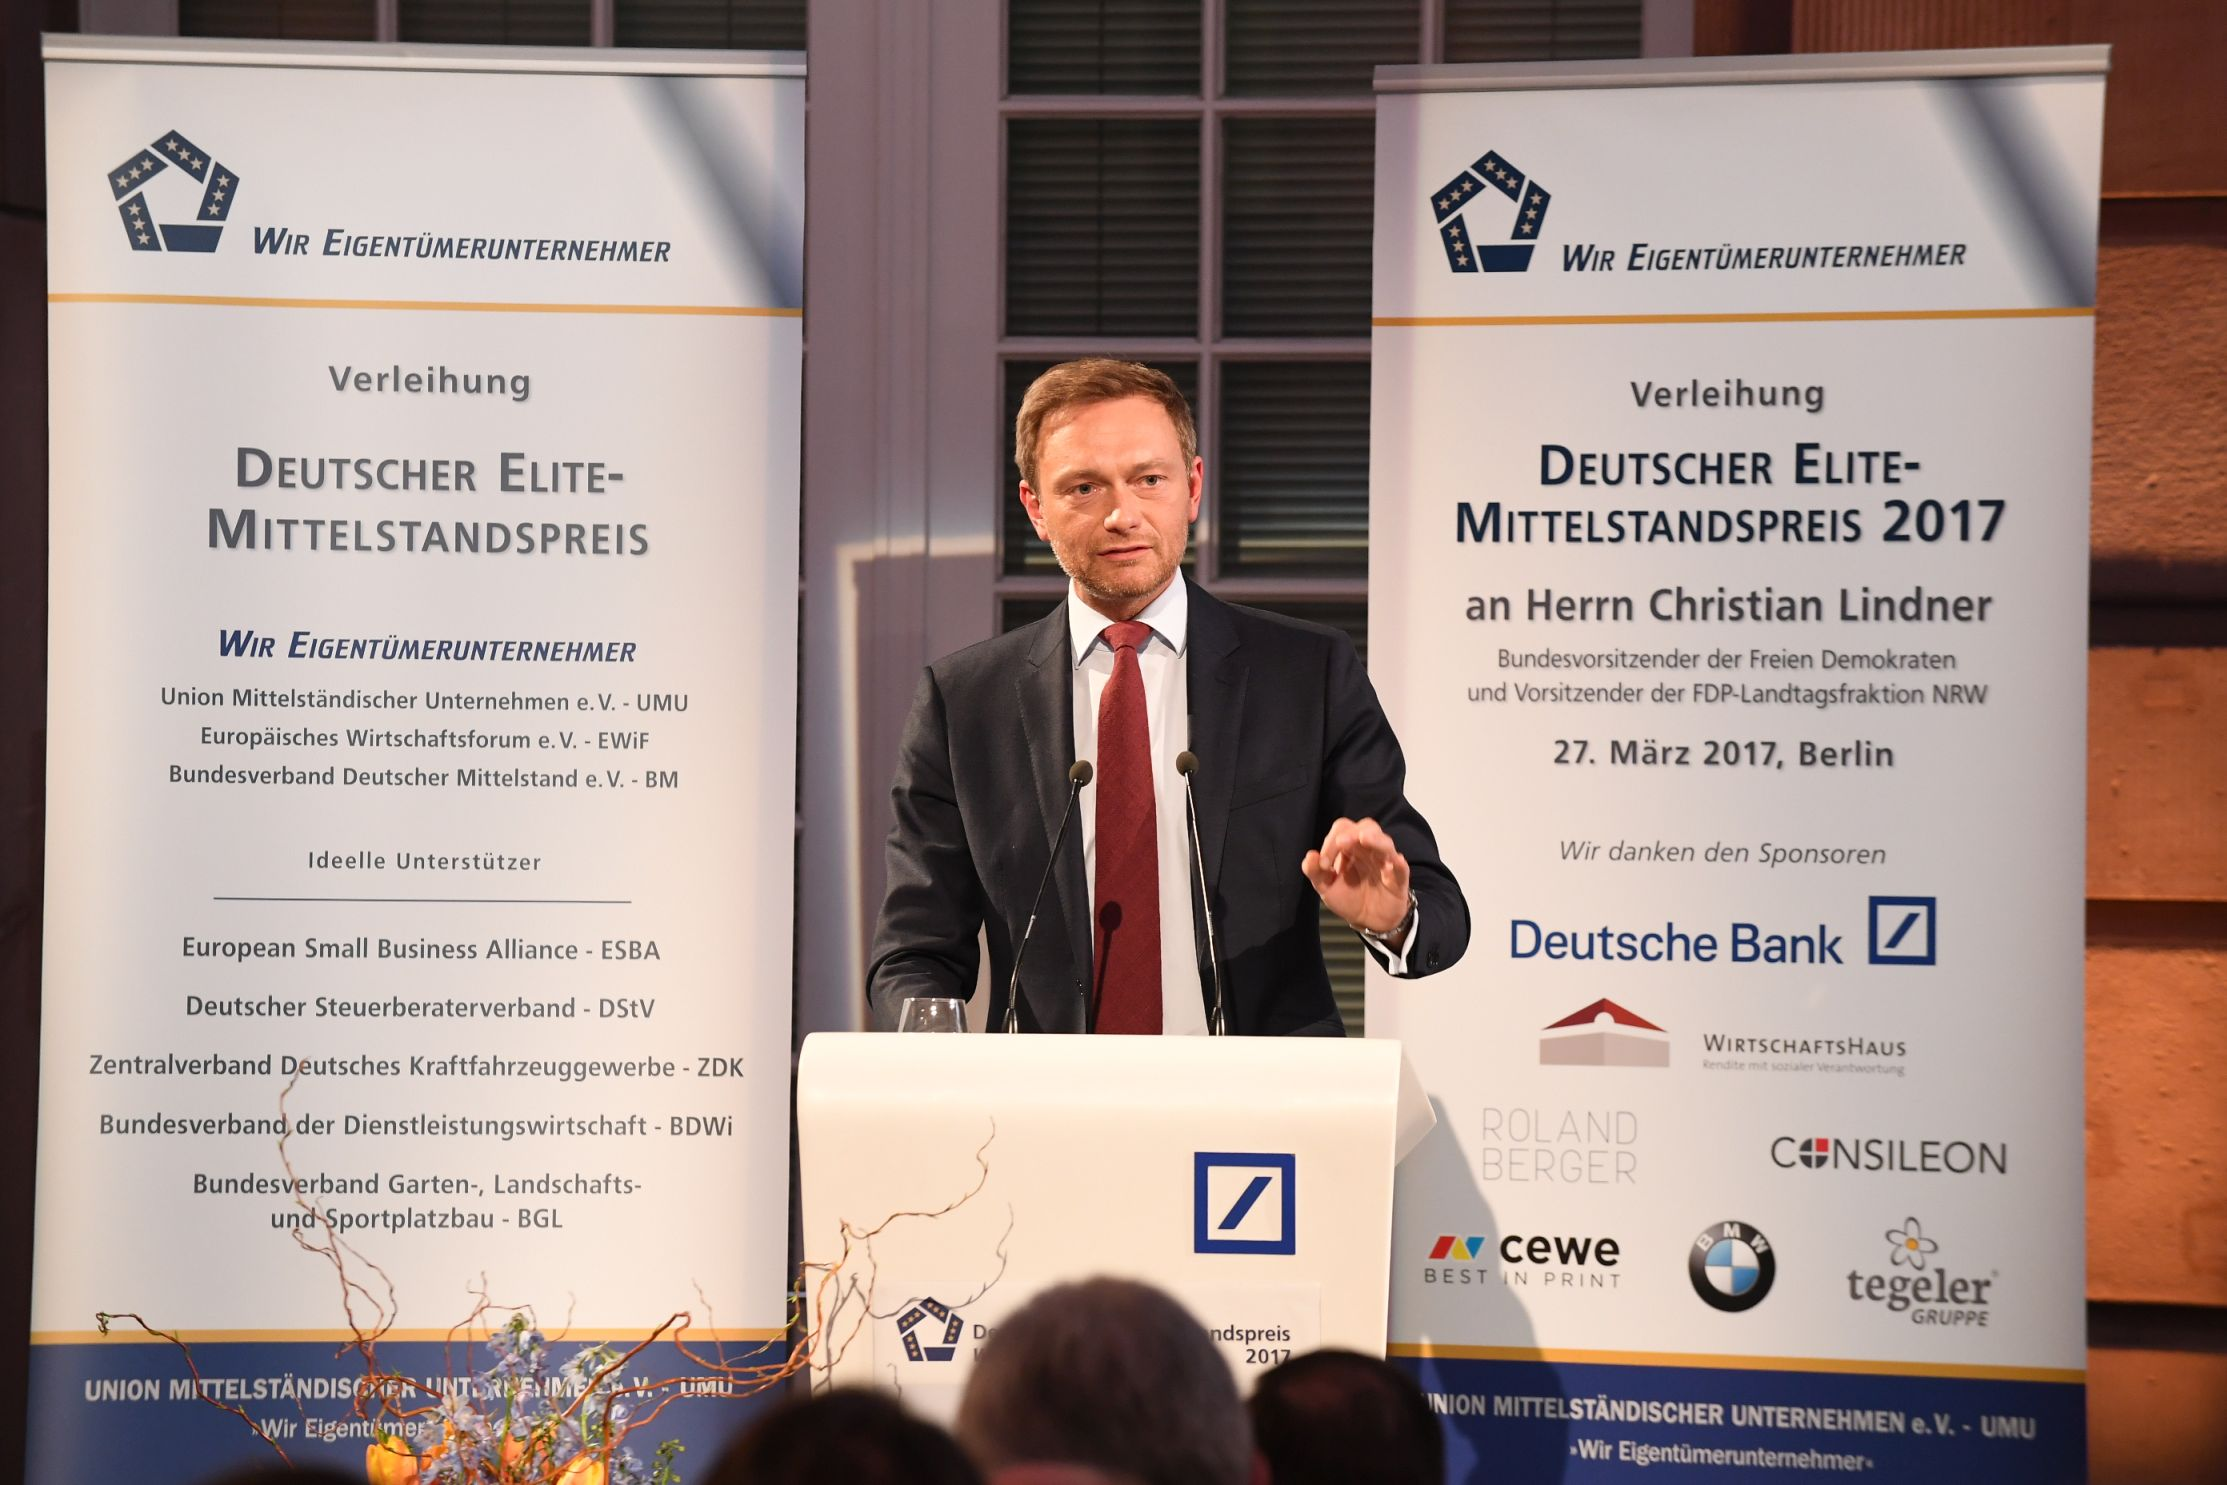 Preisträger Christian Lindner